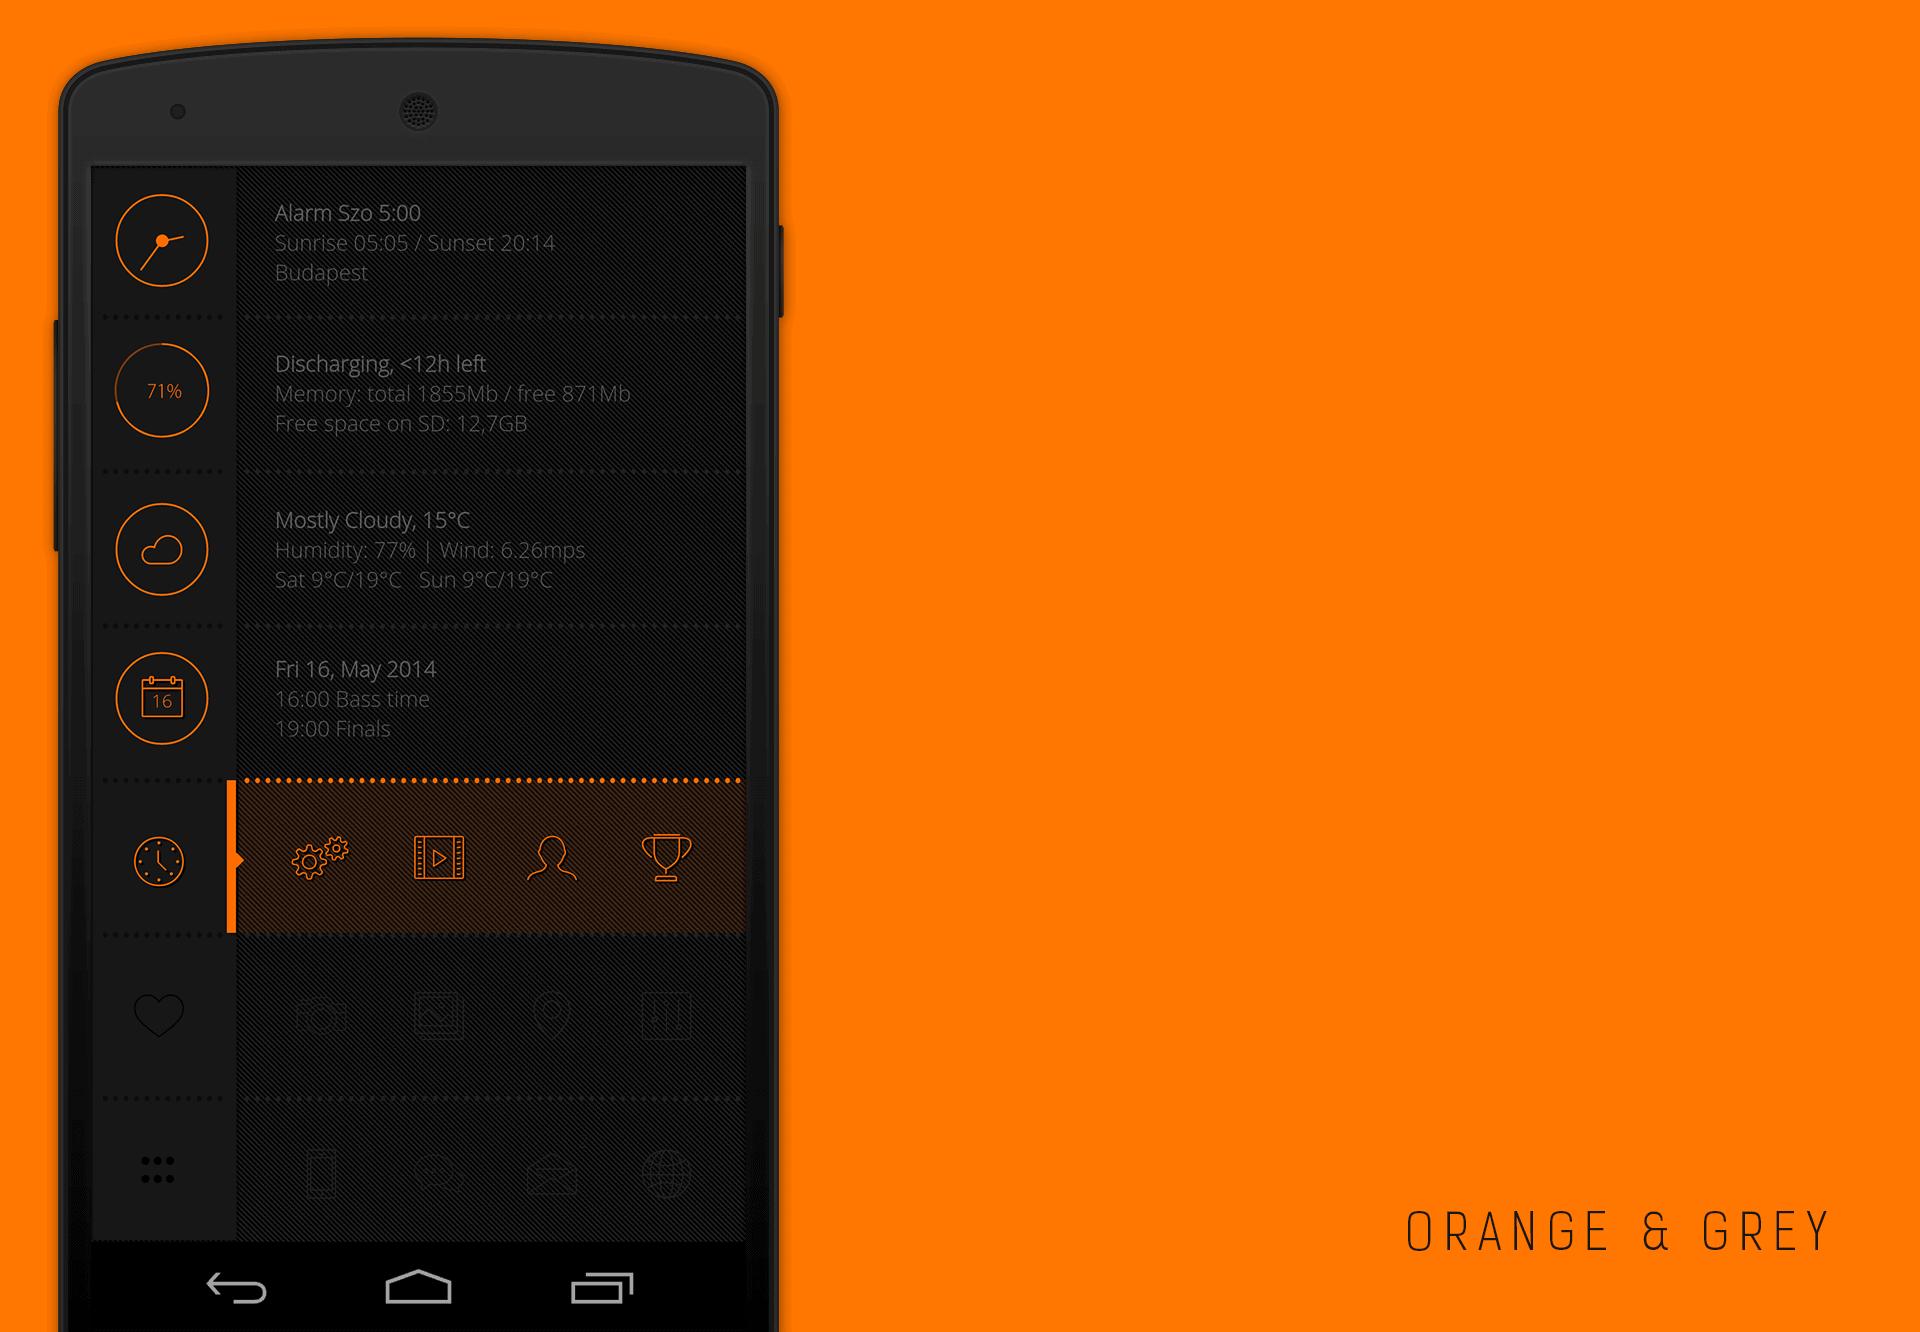 orange_and_grey_mcs3_original